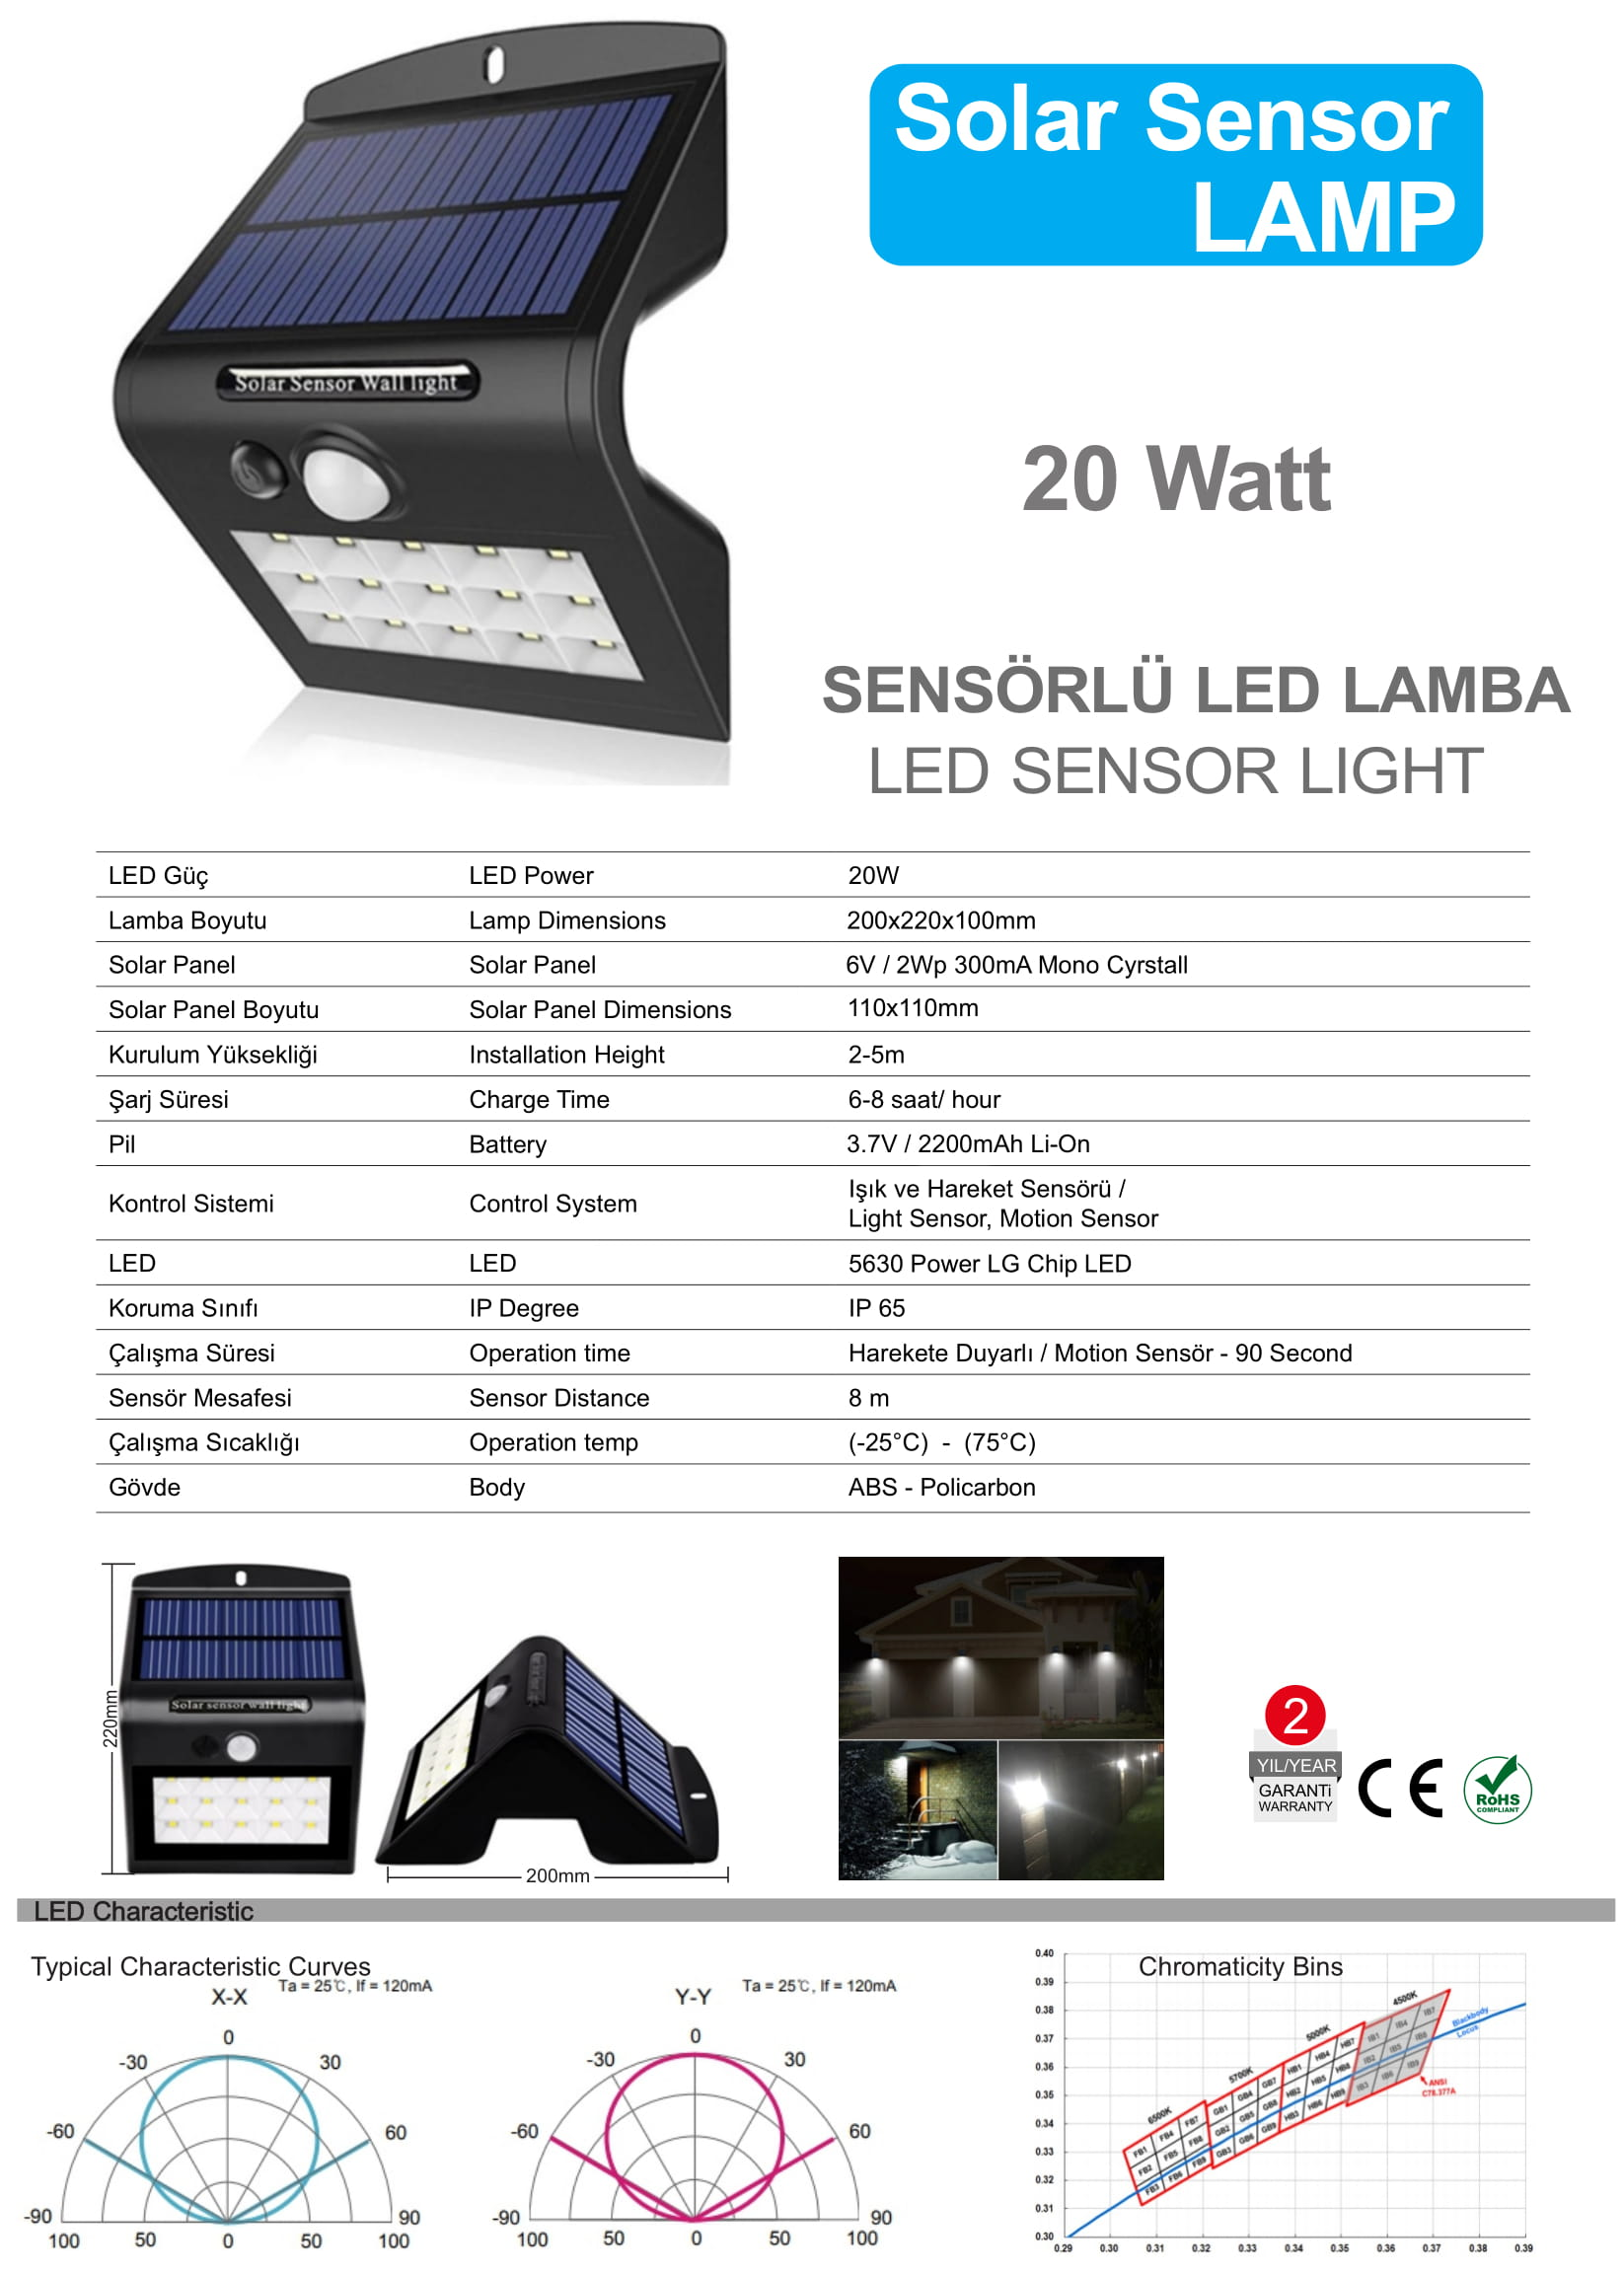 sensörlü lamba